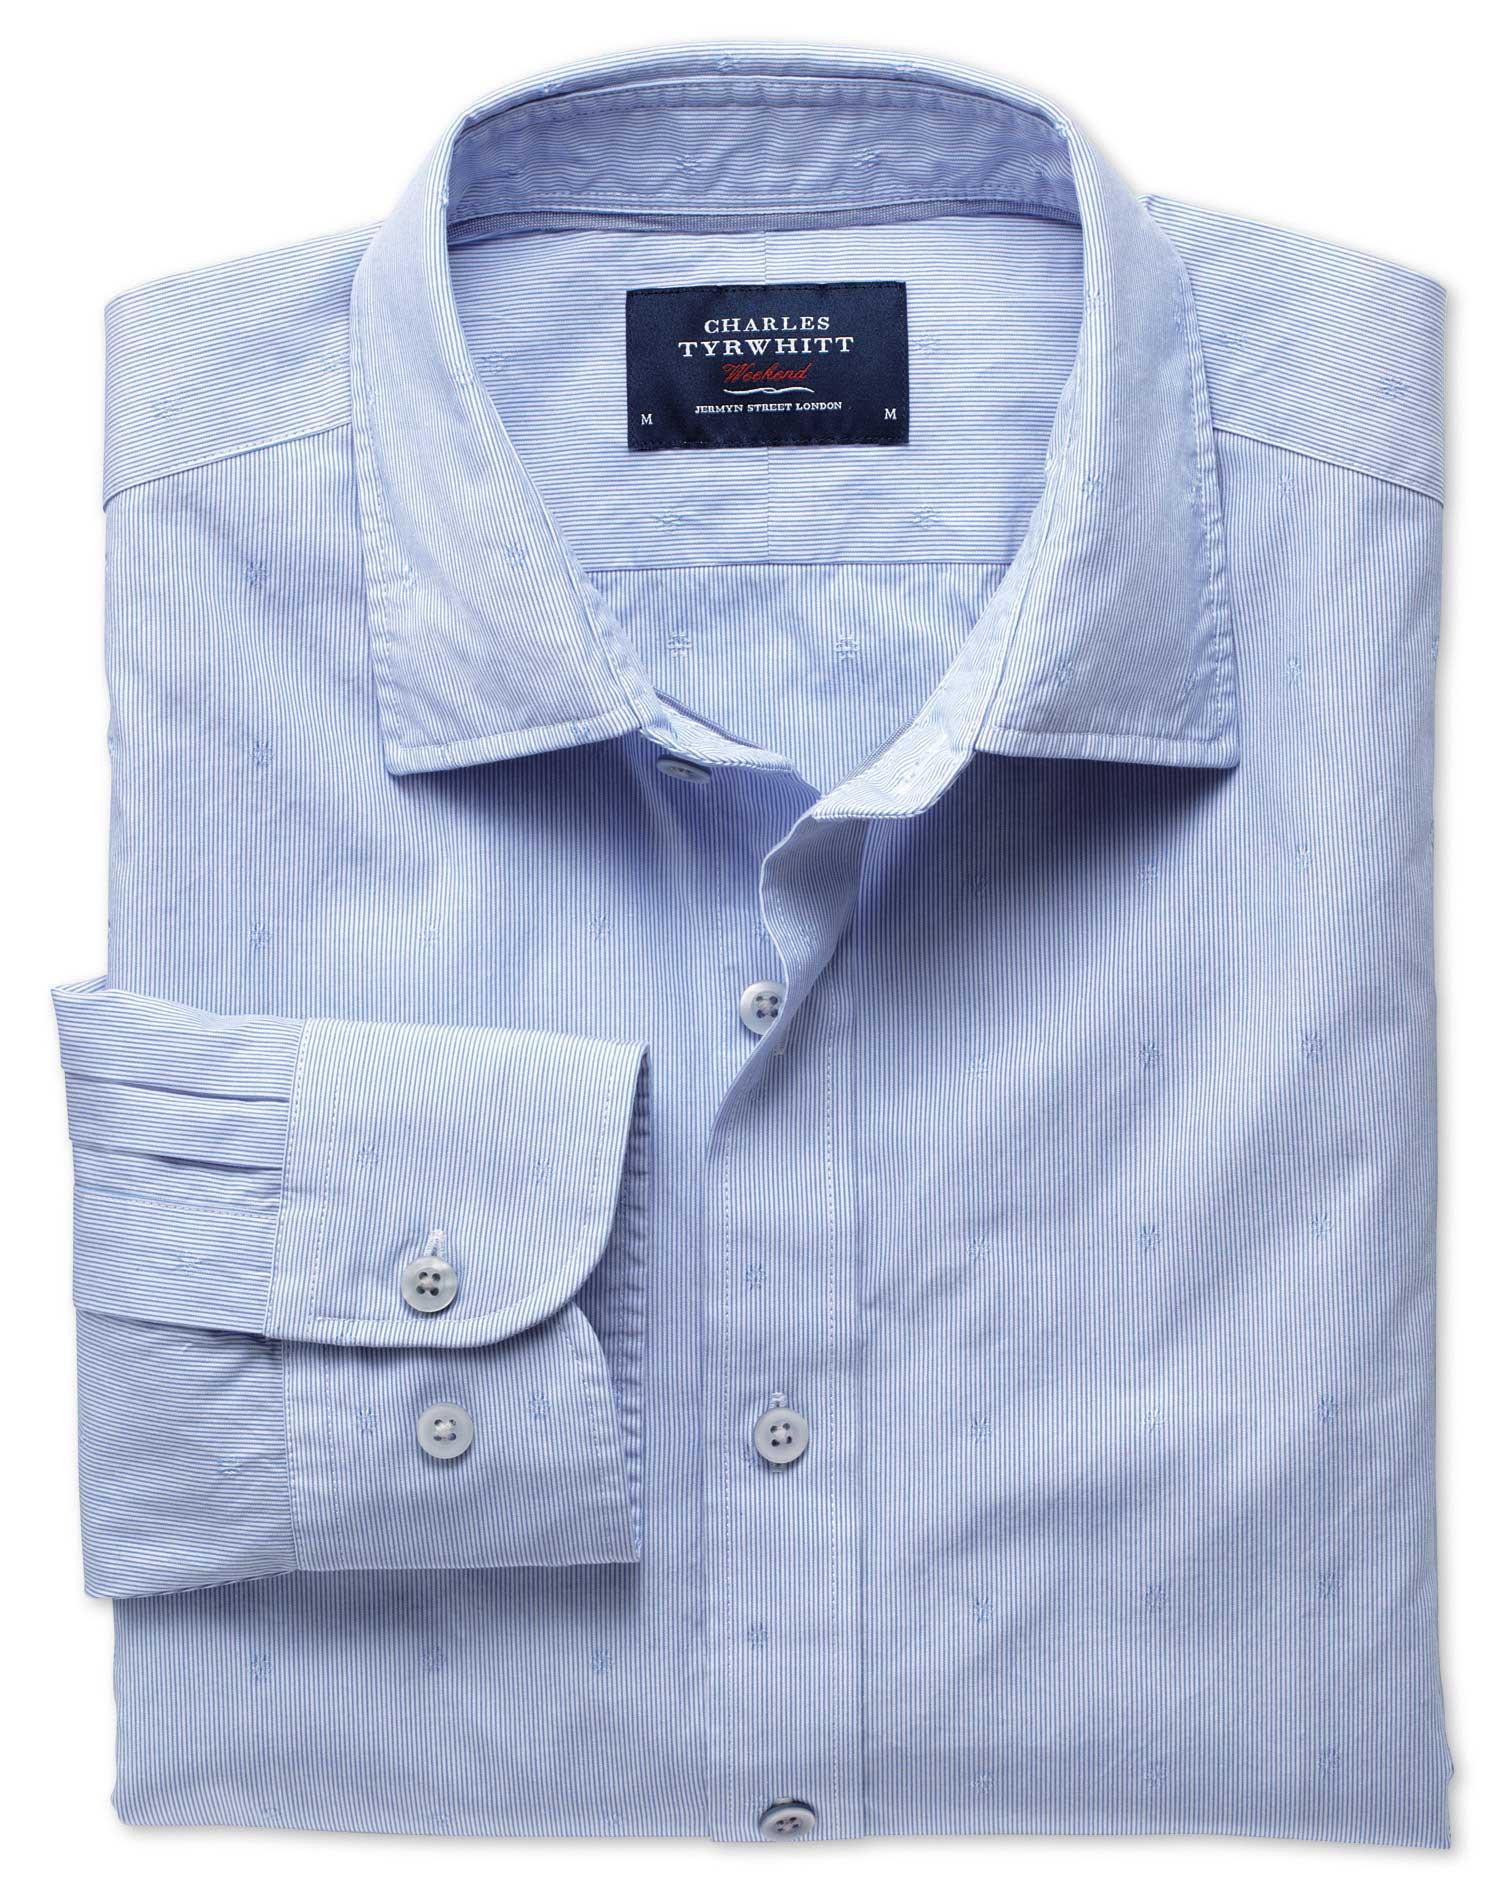 Extra Slim Fit Sky Blue Poplin Dobby Cotton Shirt Single Cuff Size XS by Charles Tyrwhitt